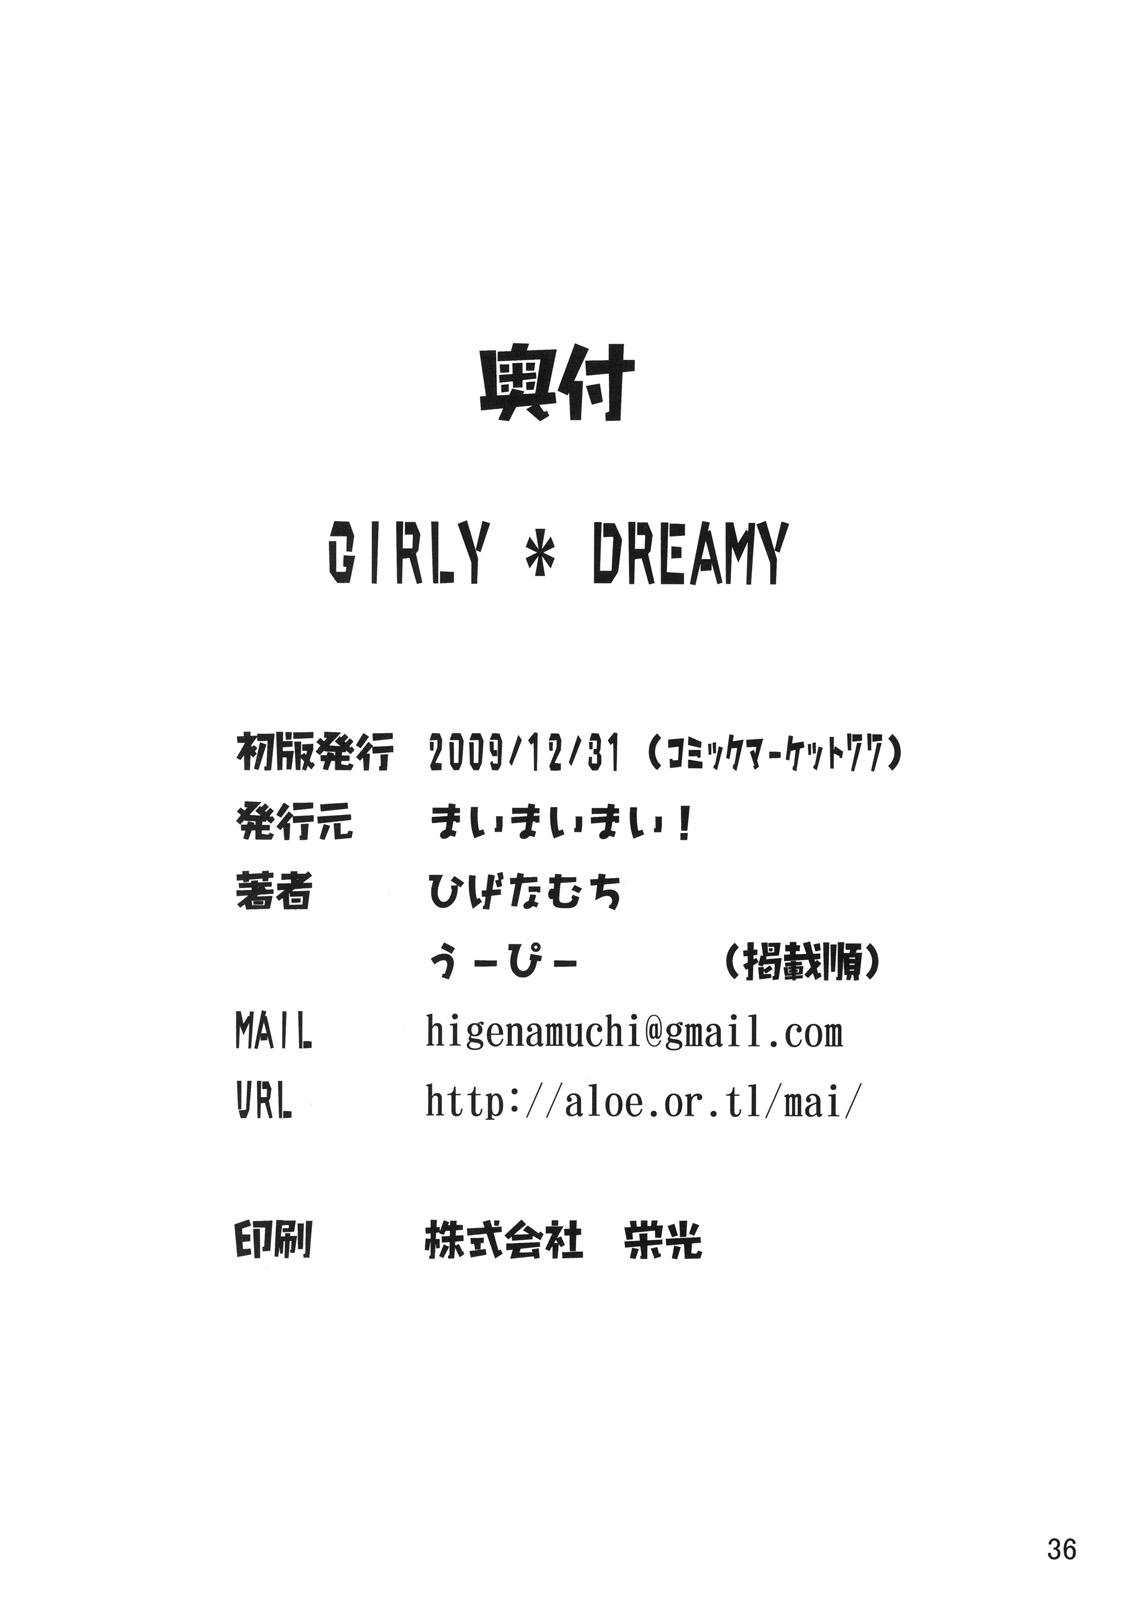 Girly*Dreamy 36